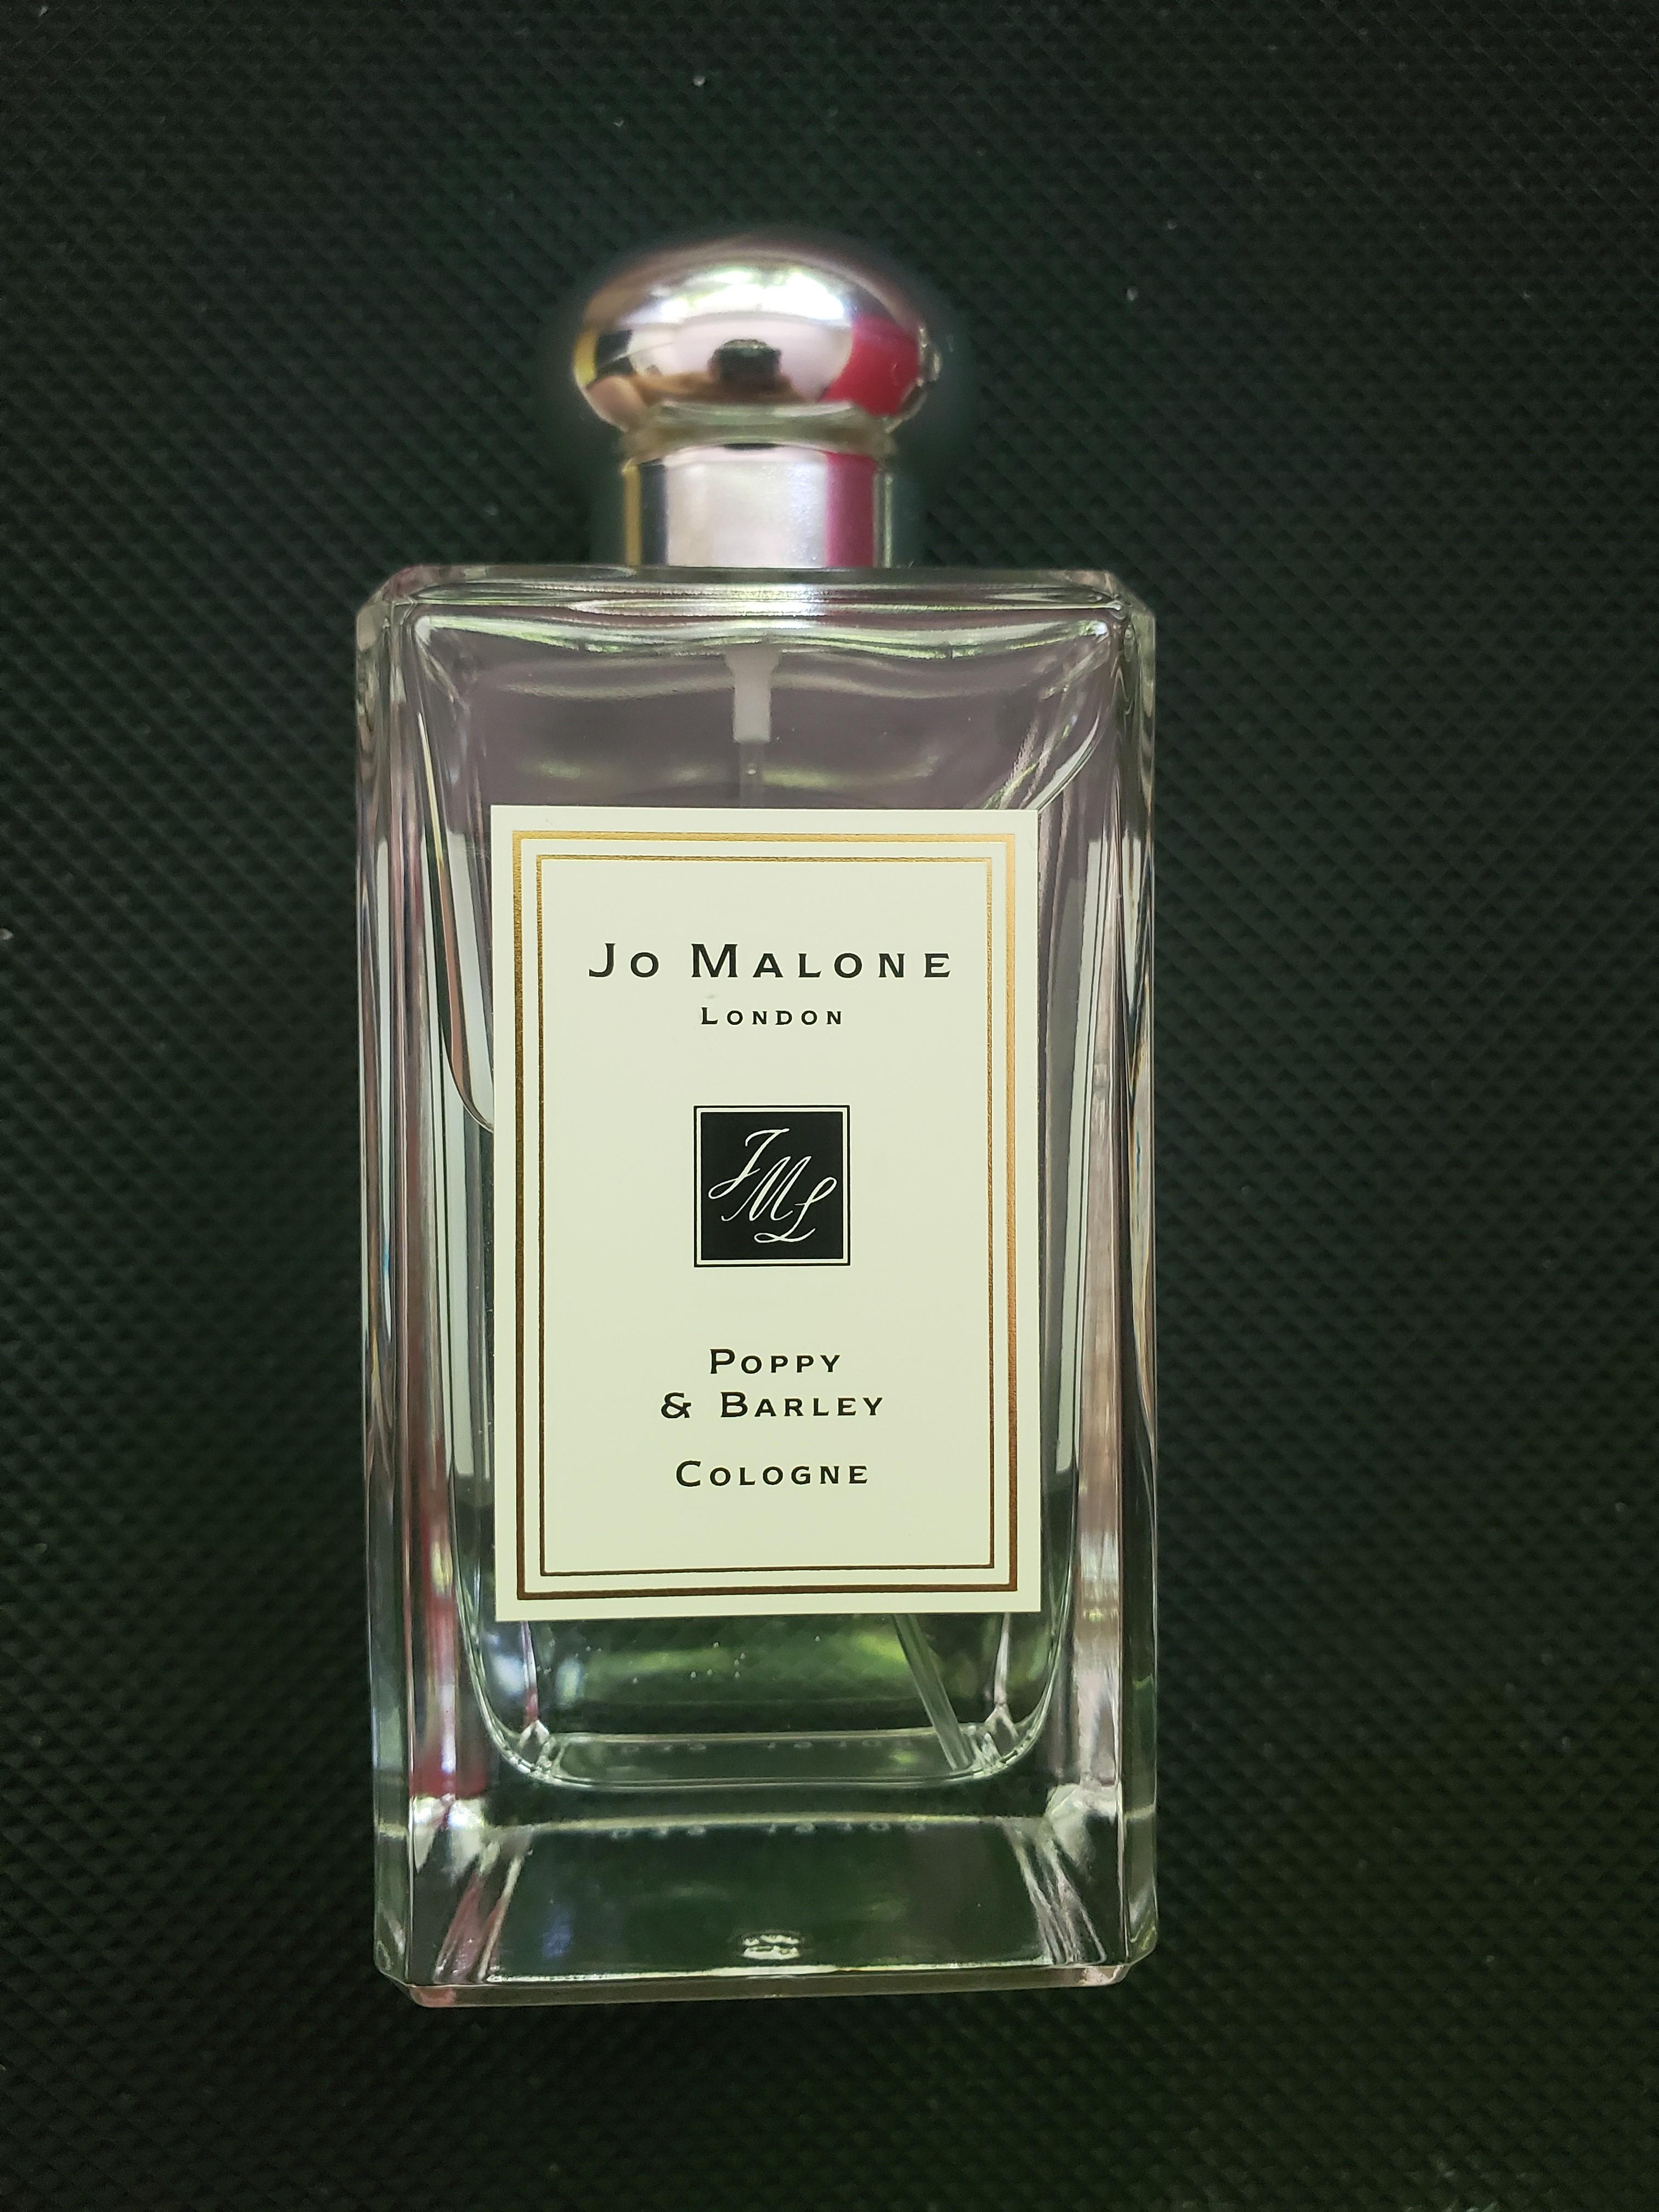 Jo Malone Poppy and barley